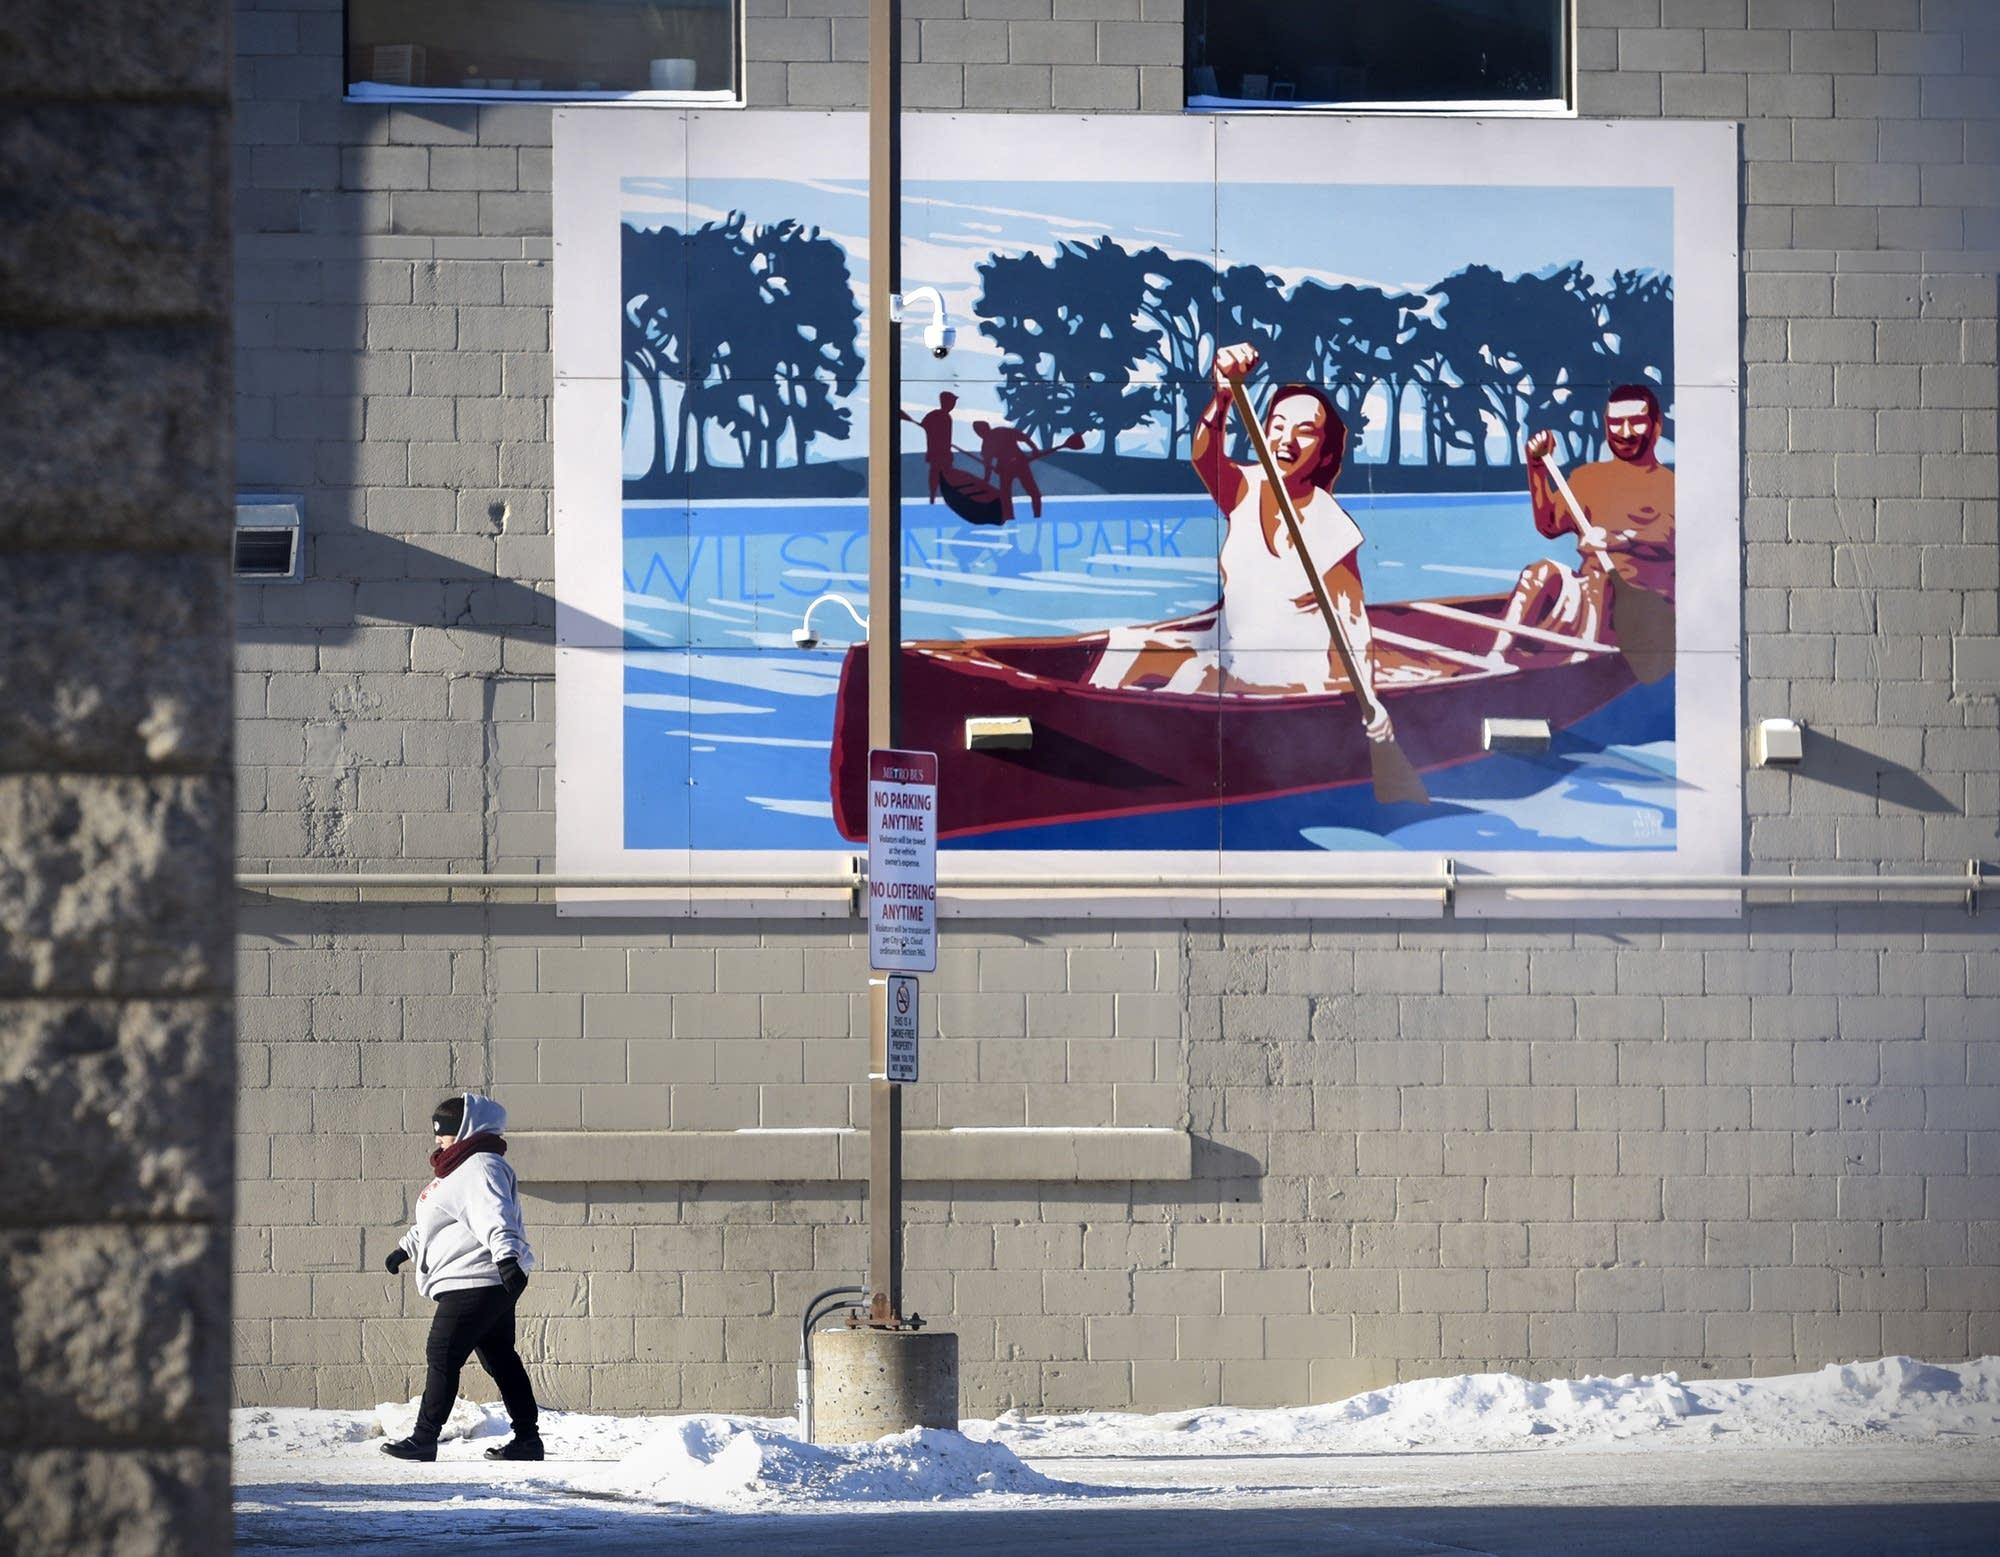 A woman walks past a mural in downtown St. Cloud, Minn.